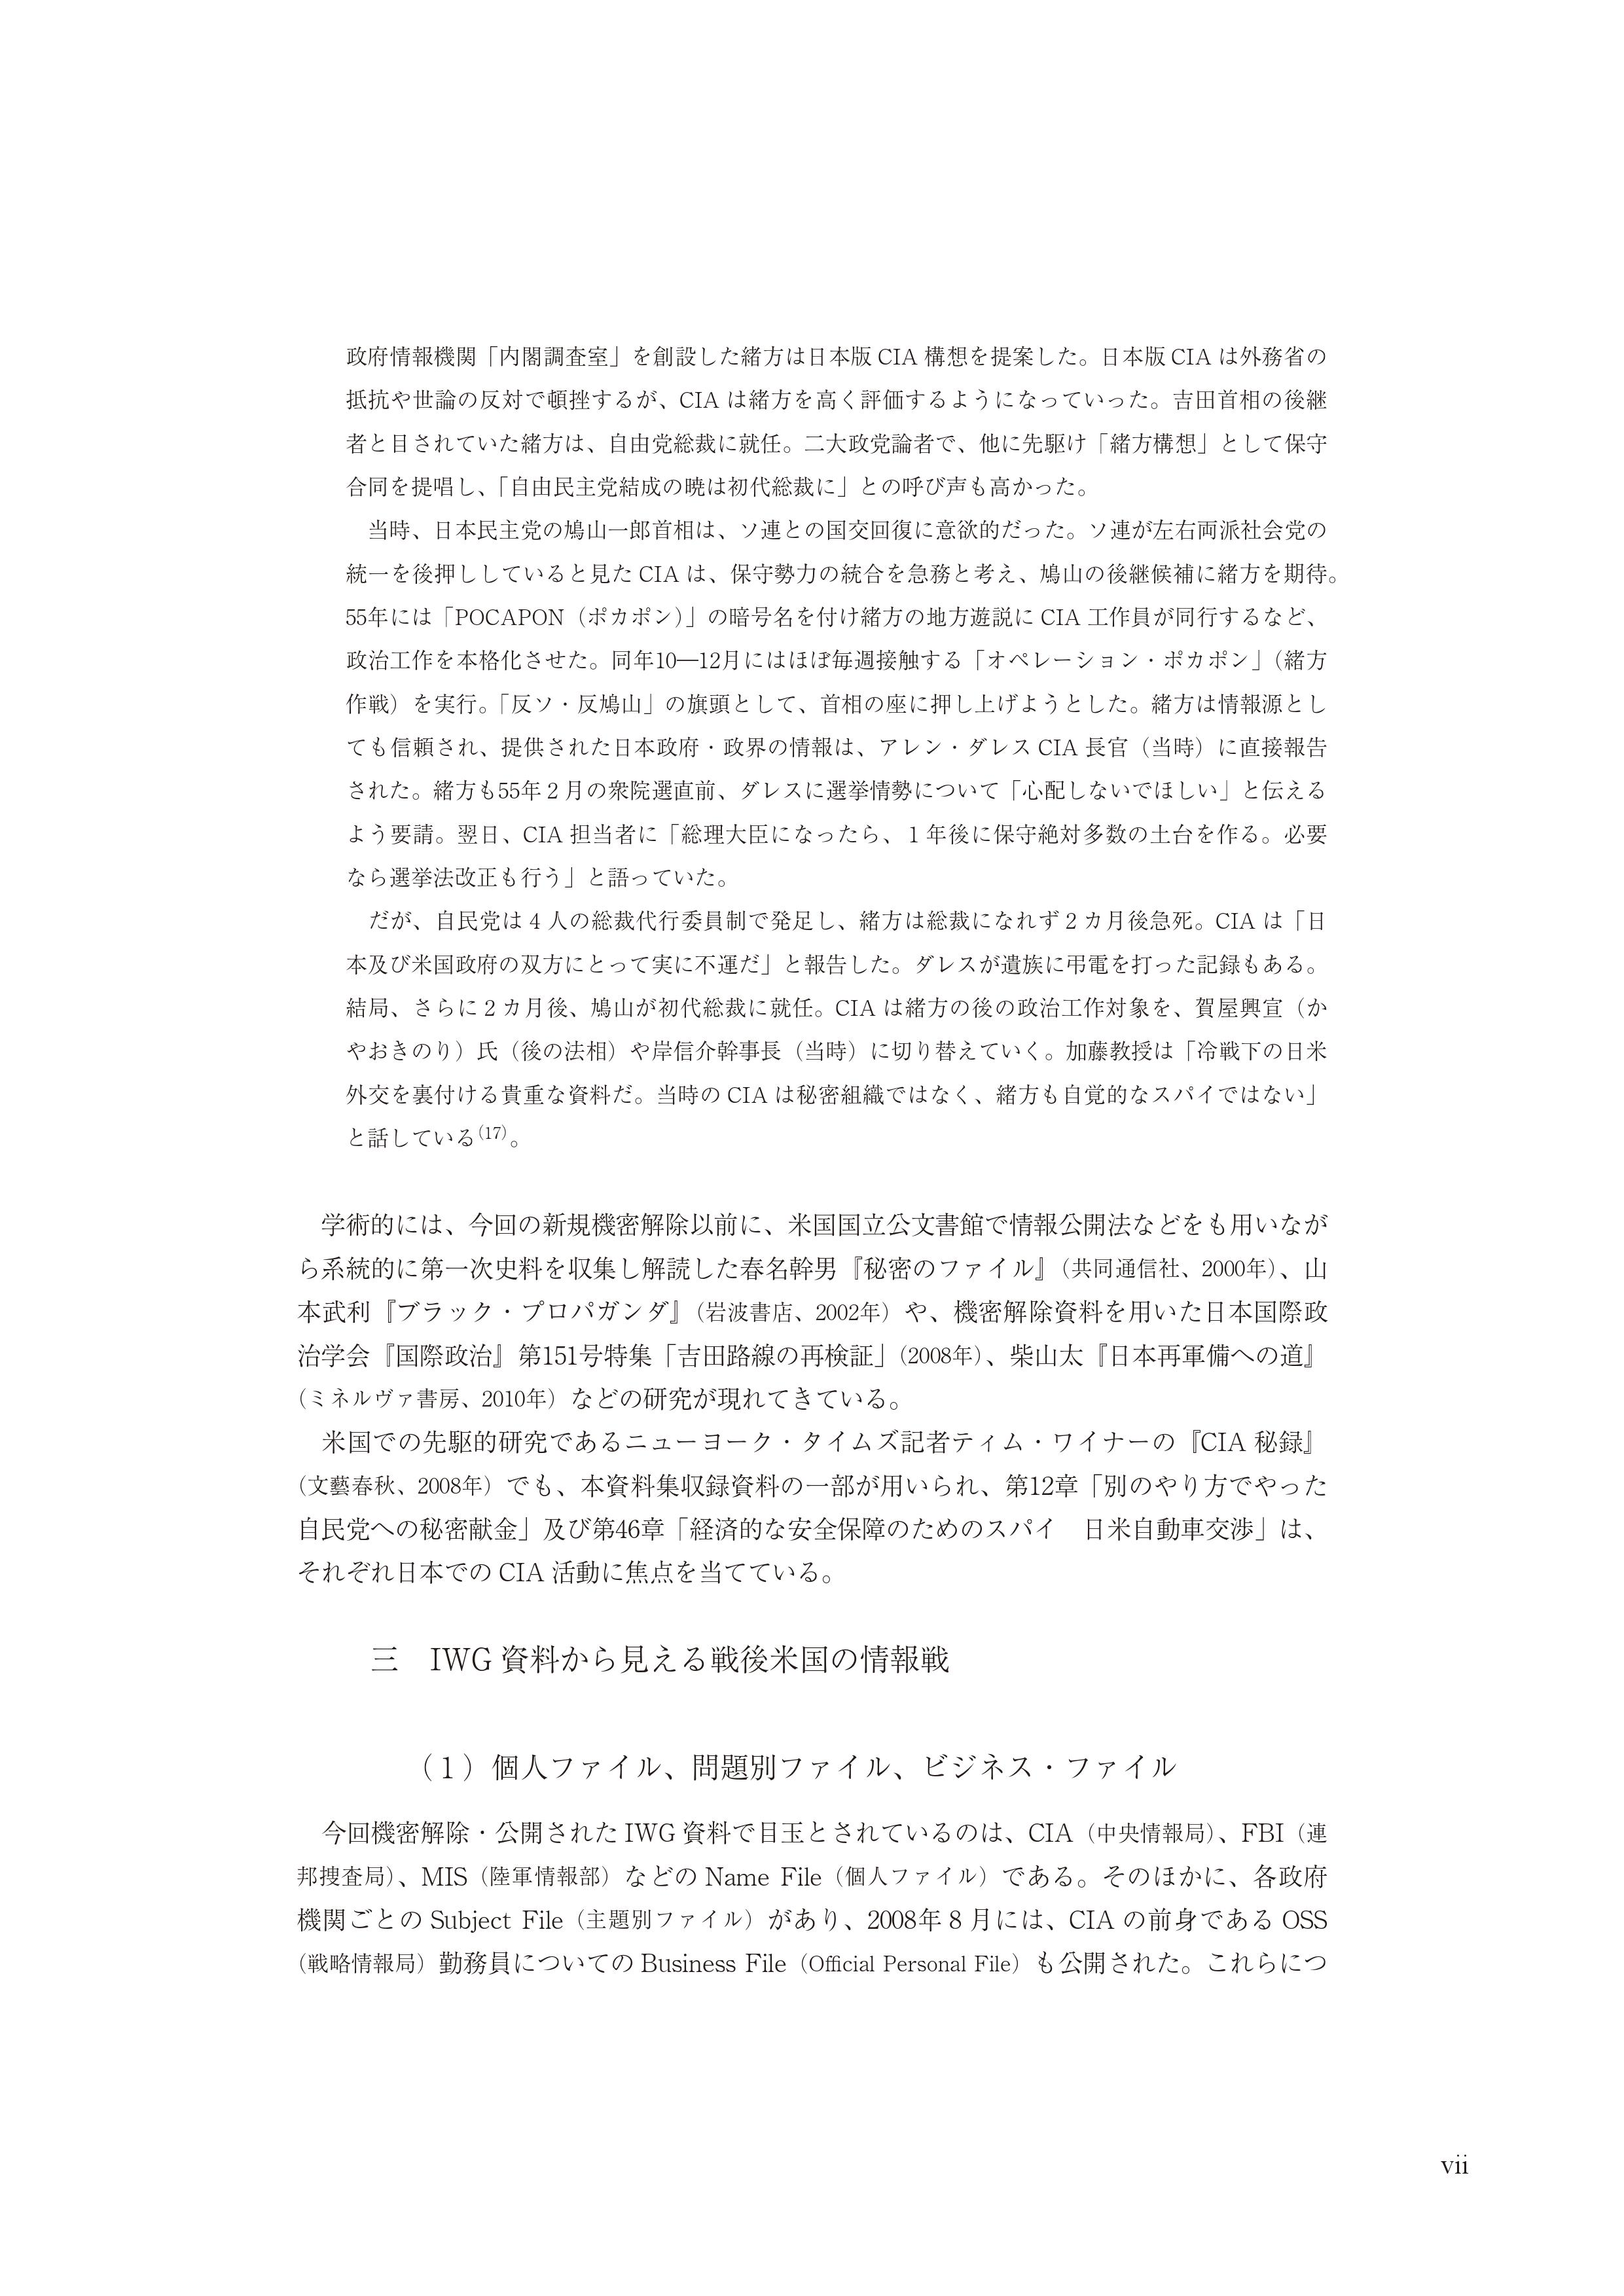 CIA日本人ファイル0001 (7)